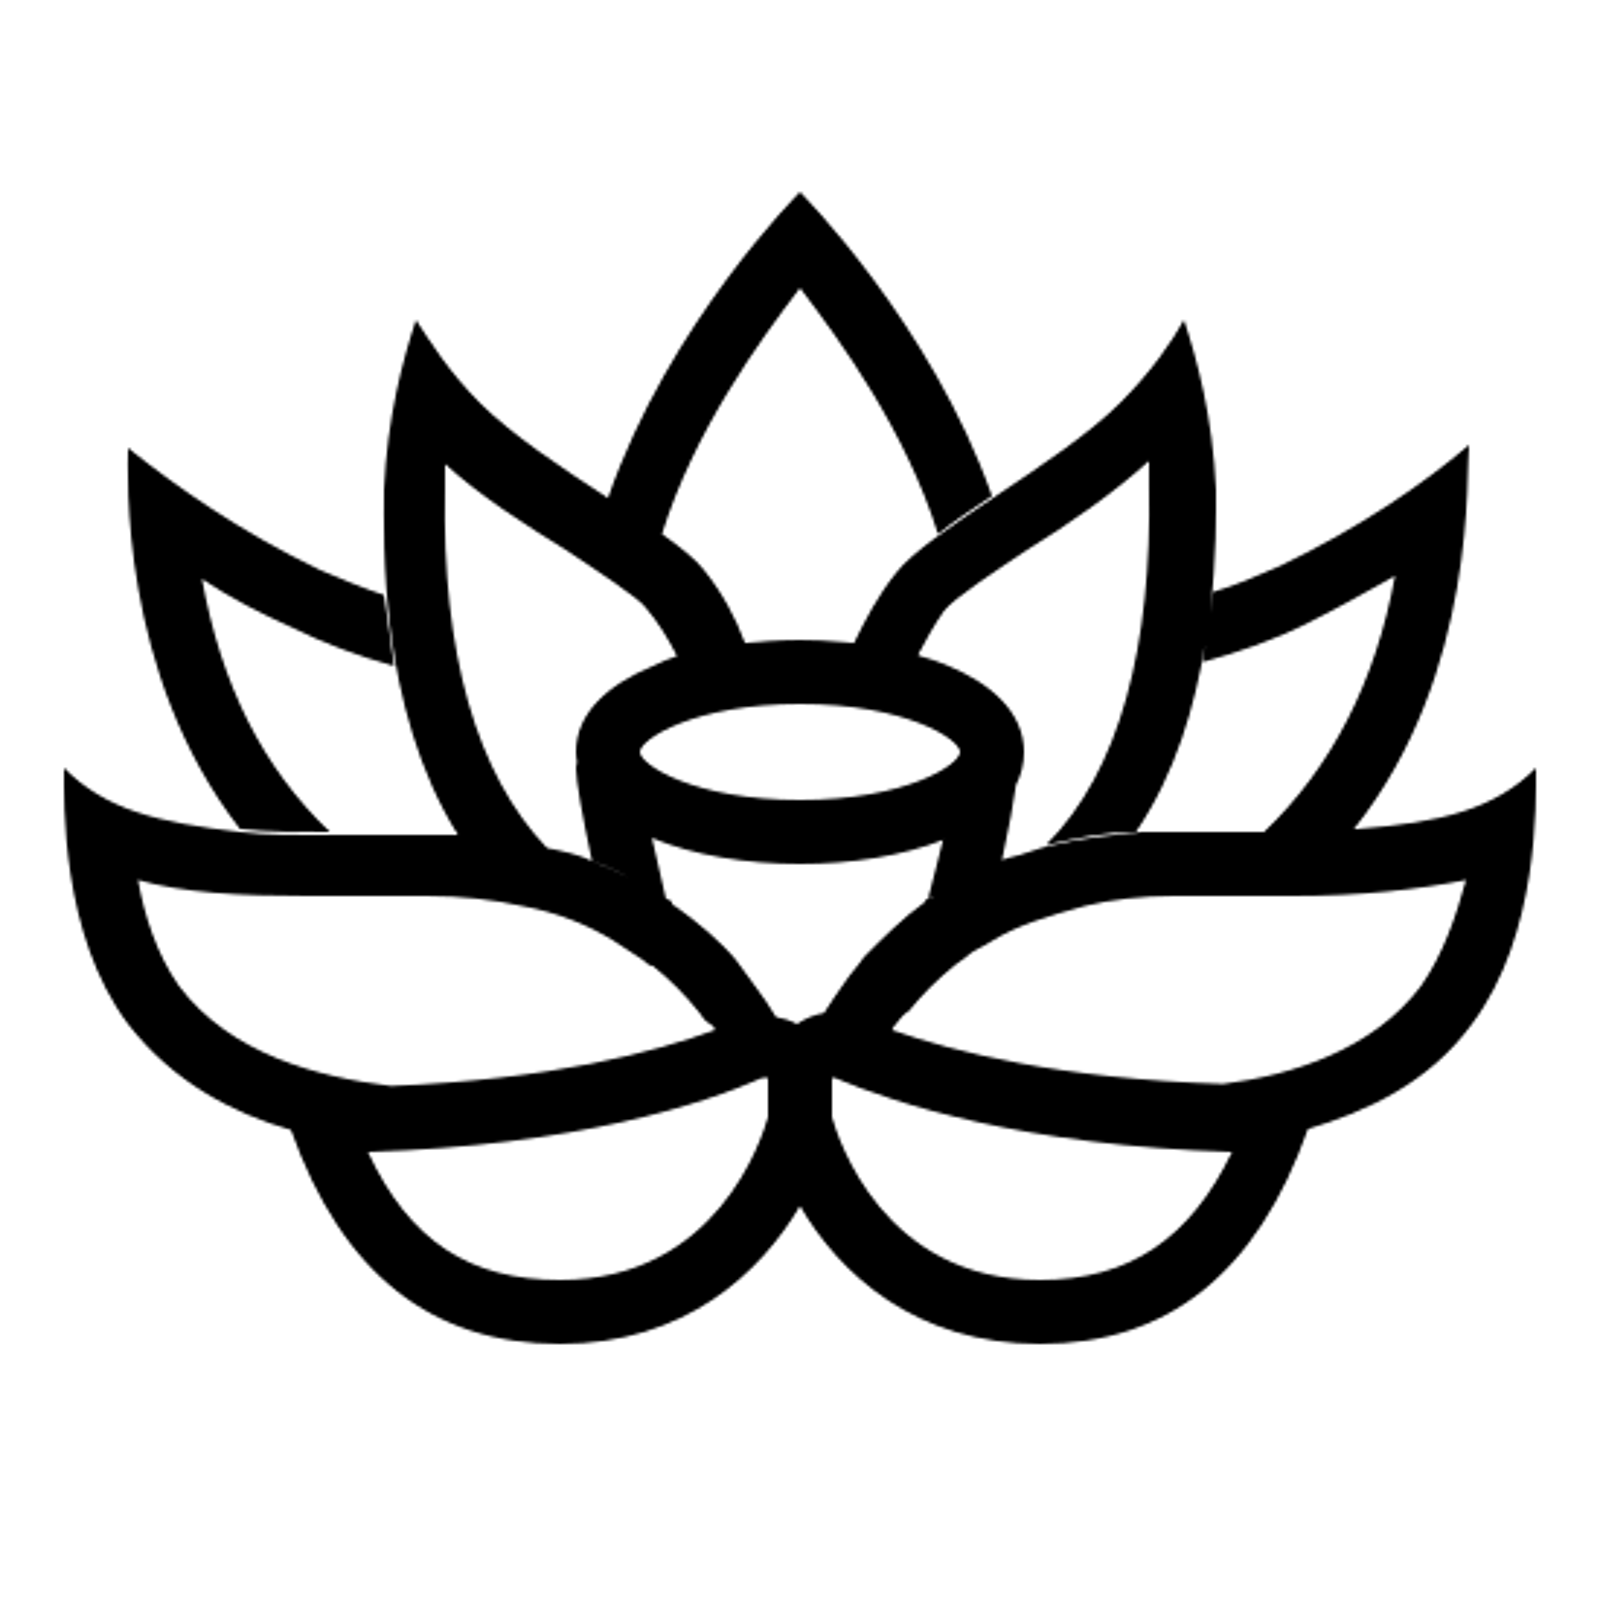 Lotos icon